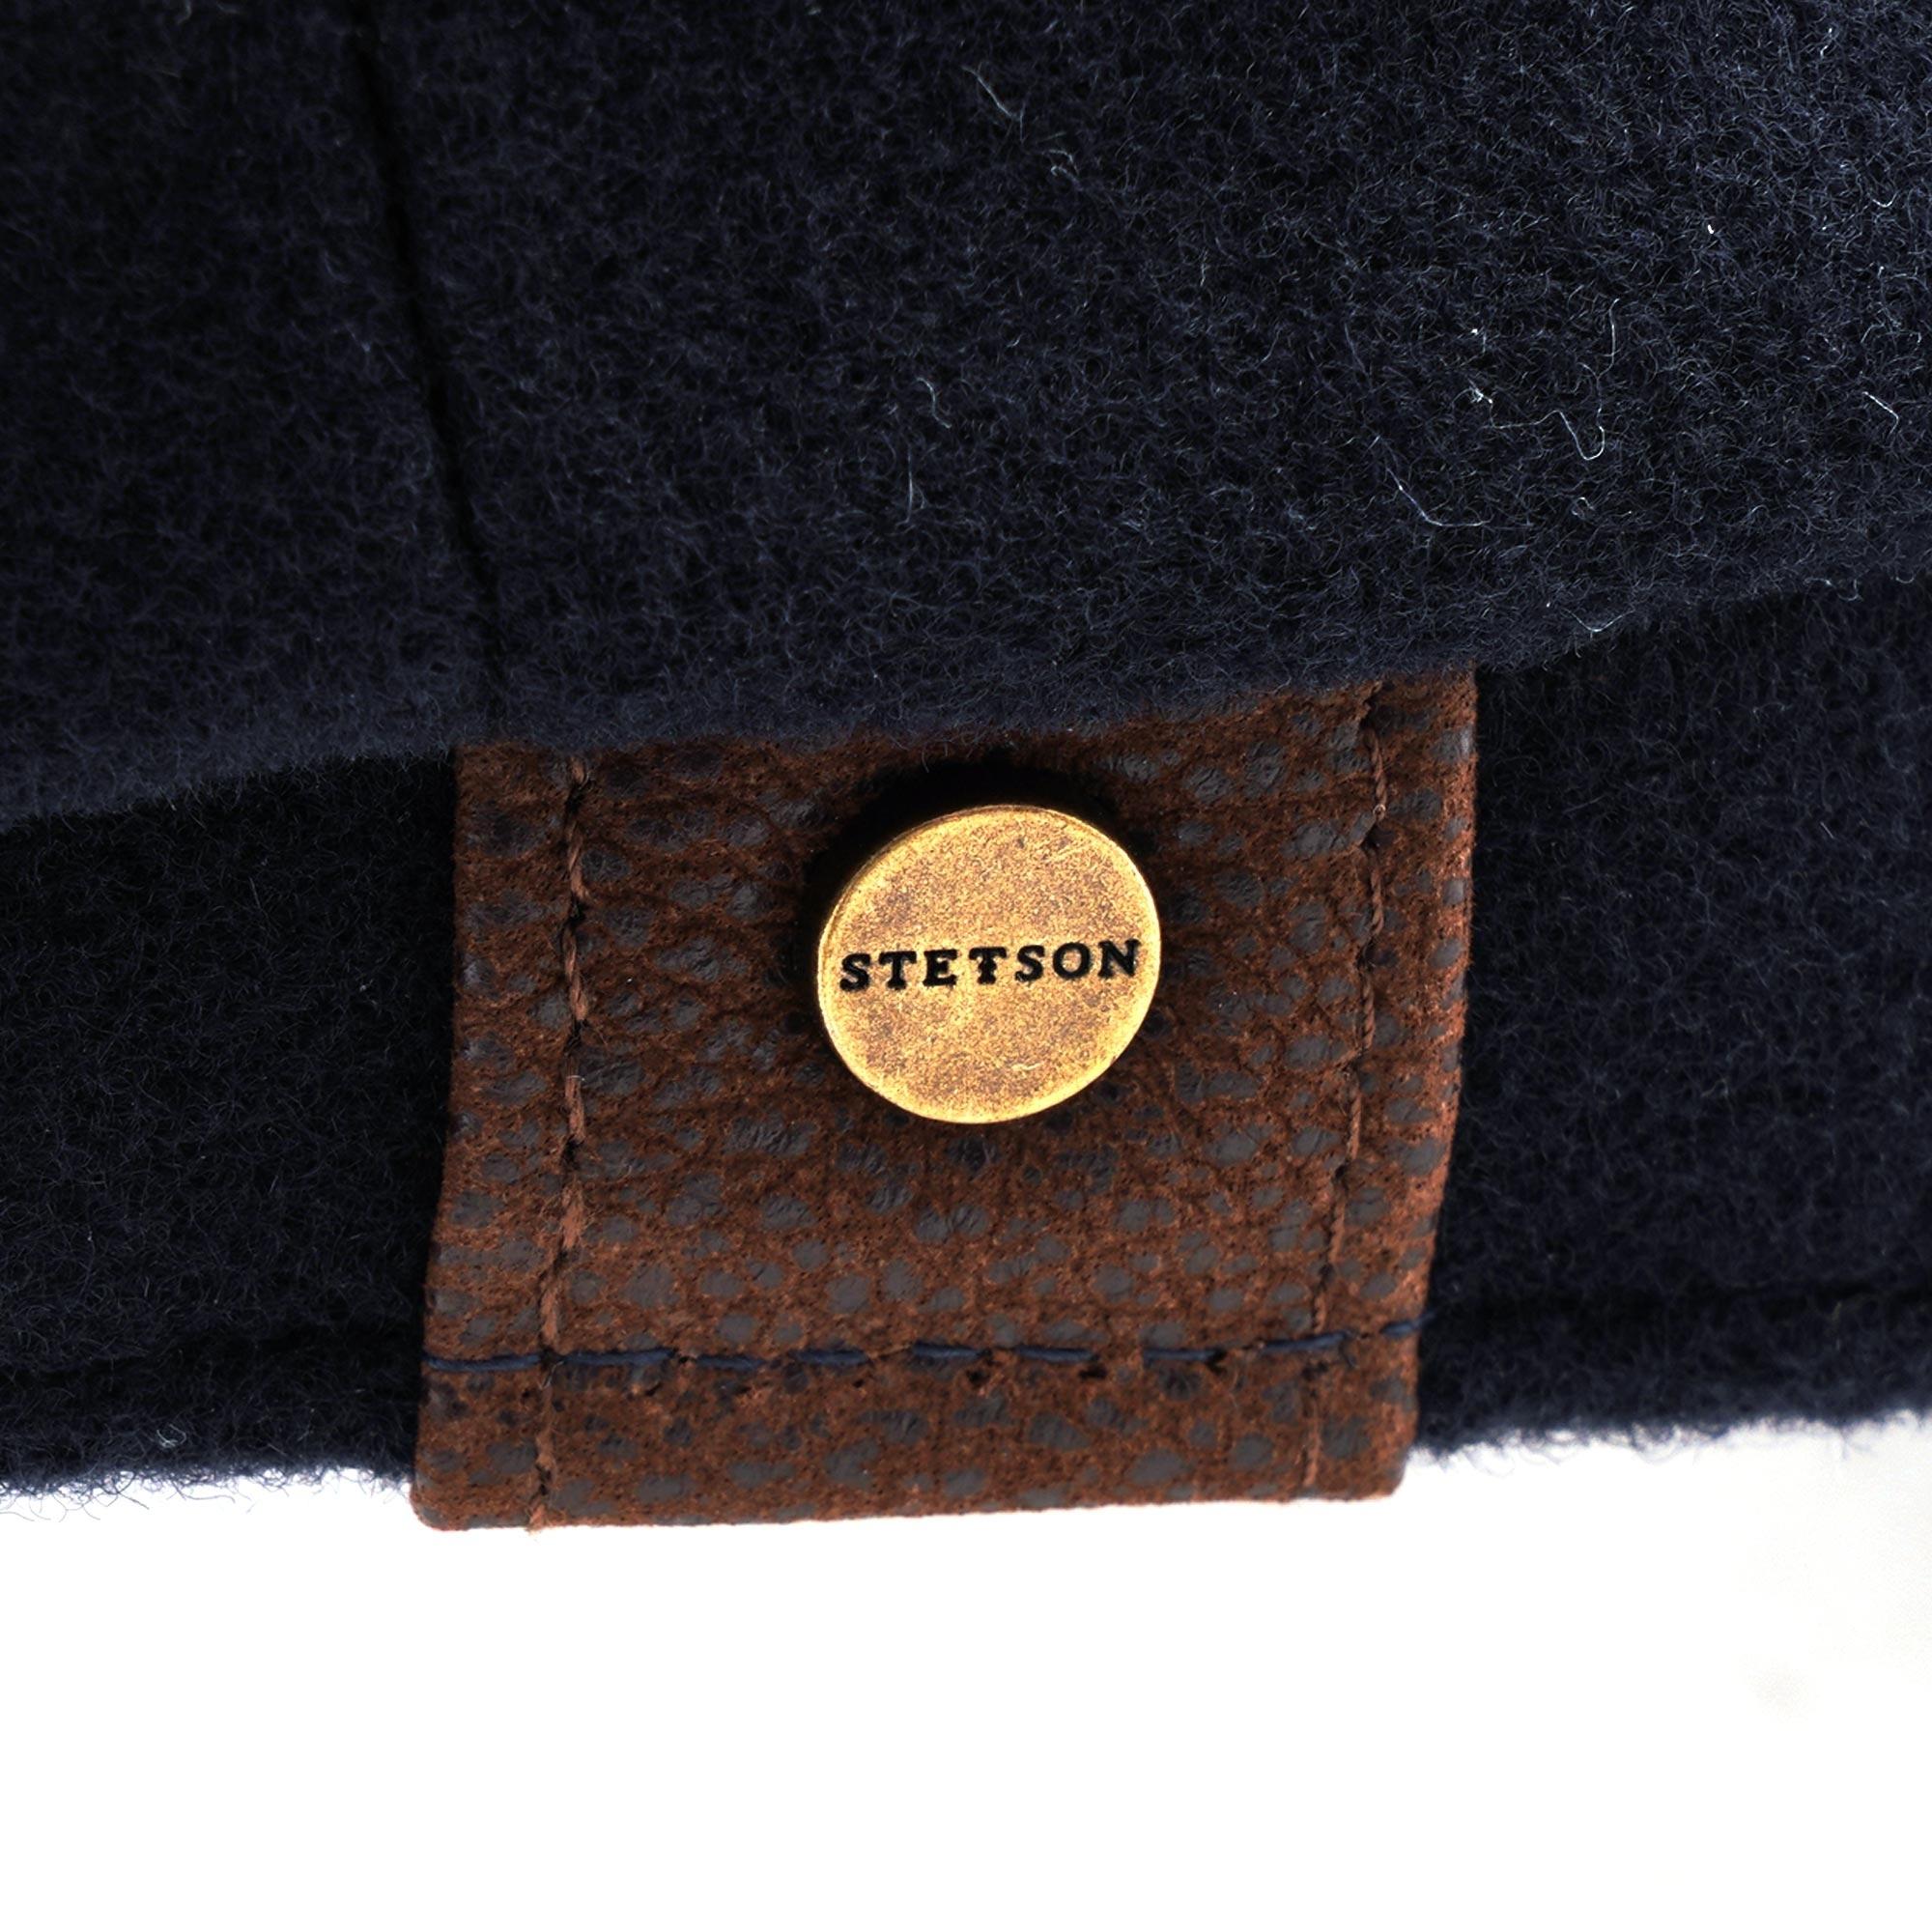 Stetson Wool Check Riders Cap Elbsegler Wollcap Ballonm/ütze Newsboy-M/ütze Baker-Boy-M/ütze Damen Futter Herbst-Winter Made in Italy mit Schirm